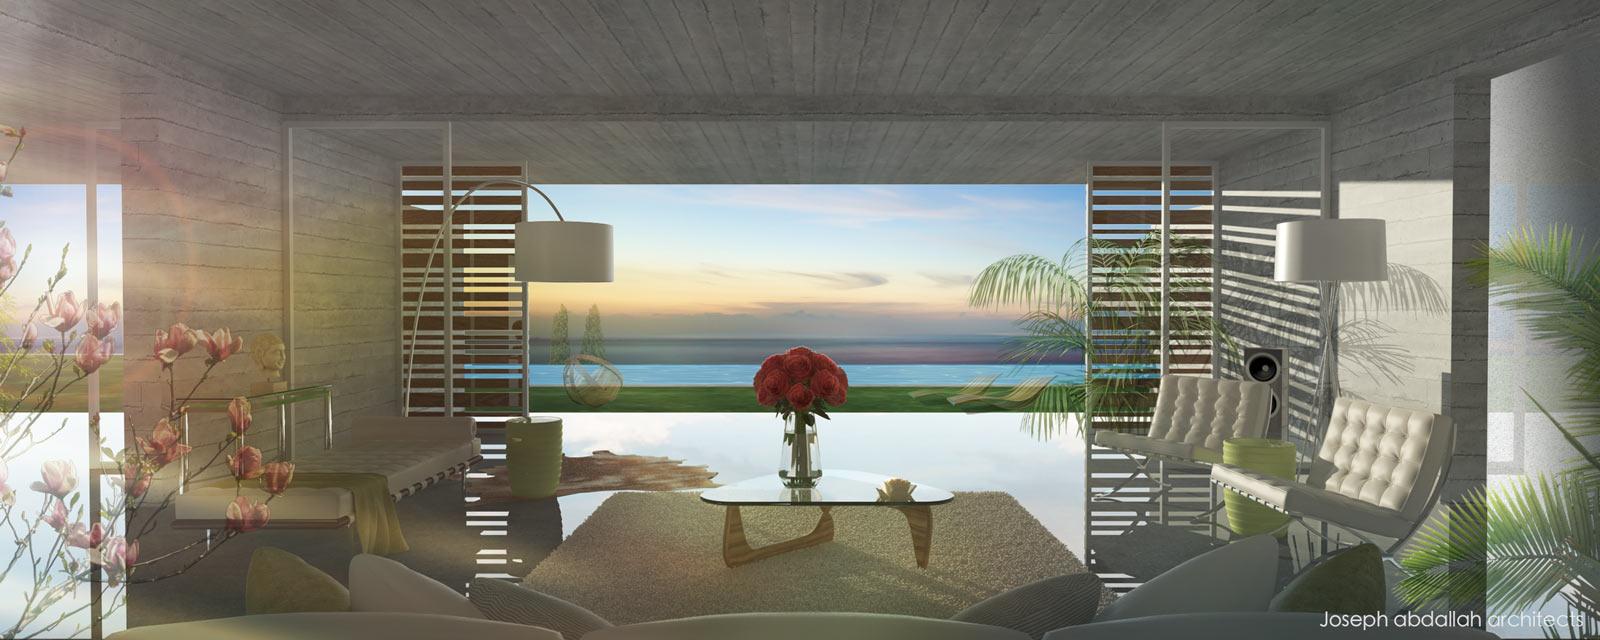 nassif-water-mirror-villa-lebanon-joseph-abdallah-architects-5